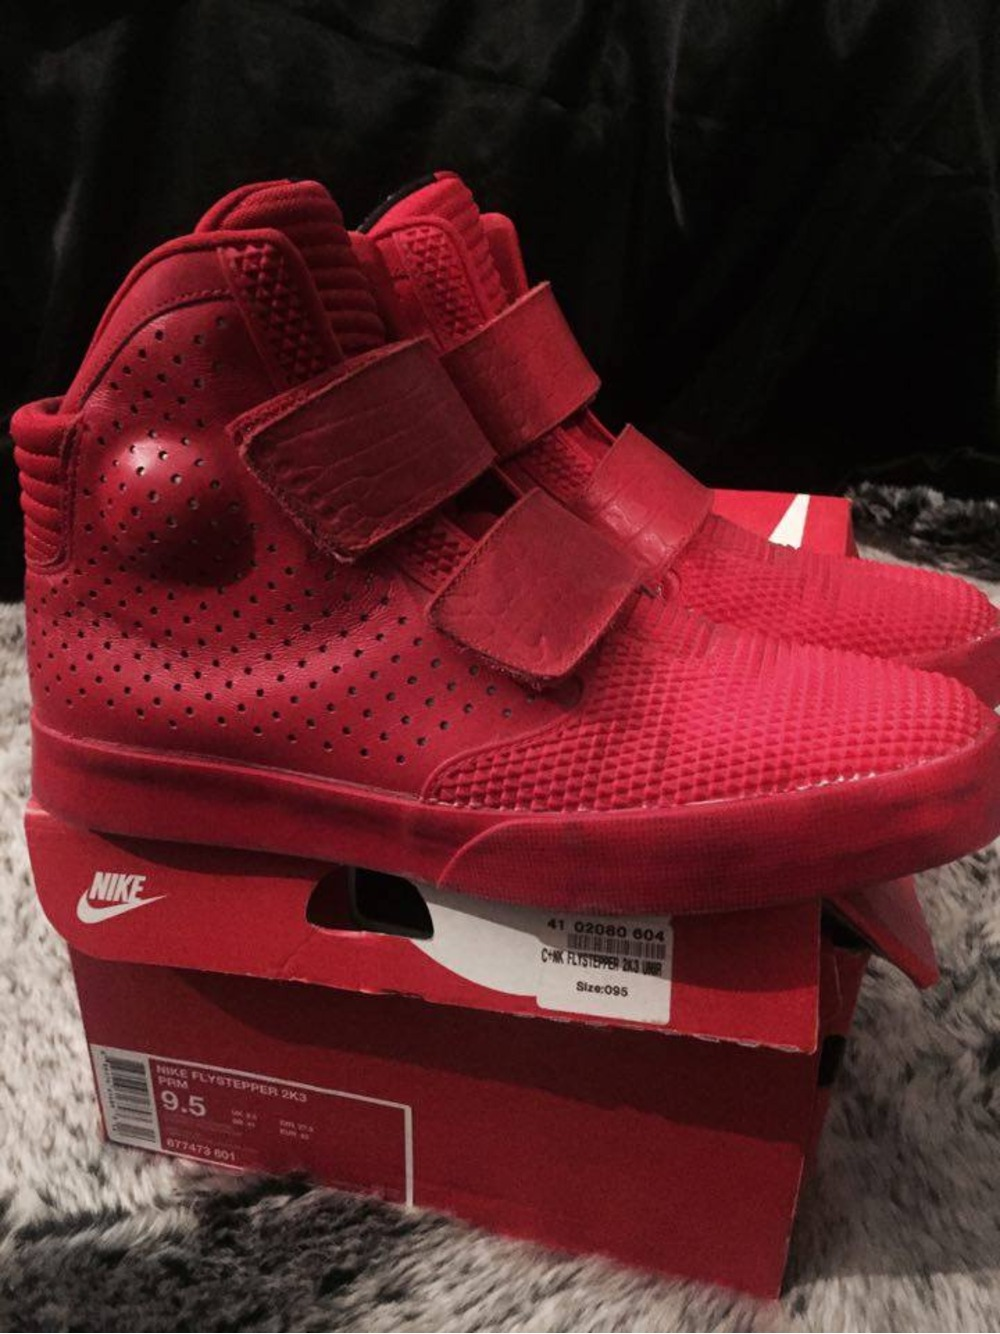 wholesale dealer e74a2 d5249 ... Nike Flystepper 2K3 Crescent City x Red Edition - photo 33 ...